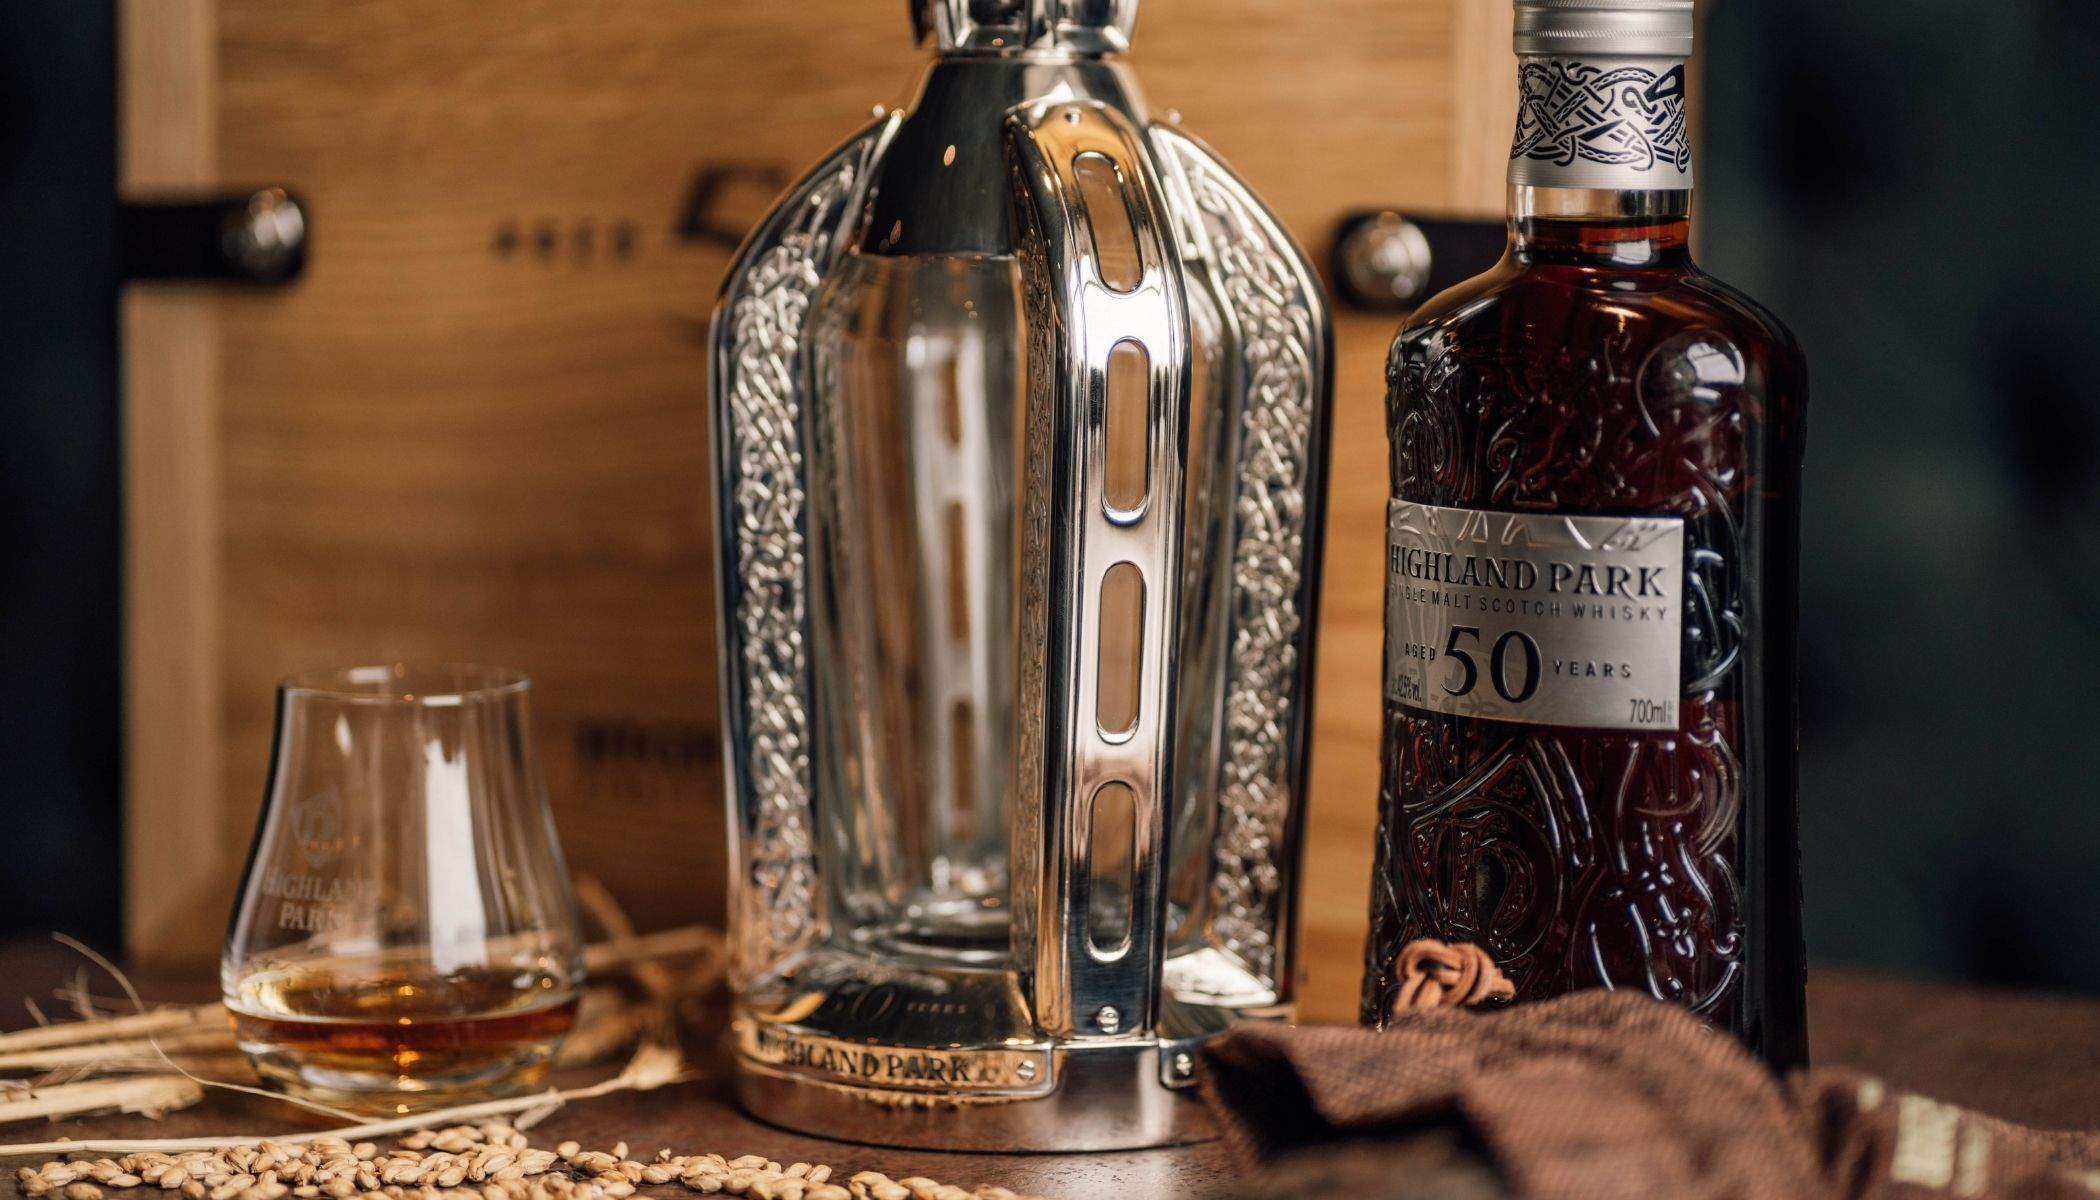 Highland Park Whiskies